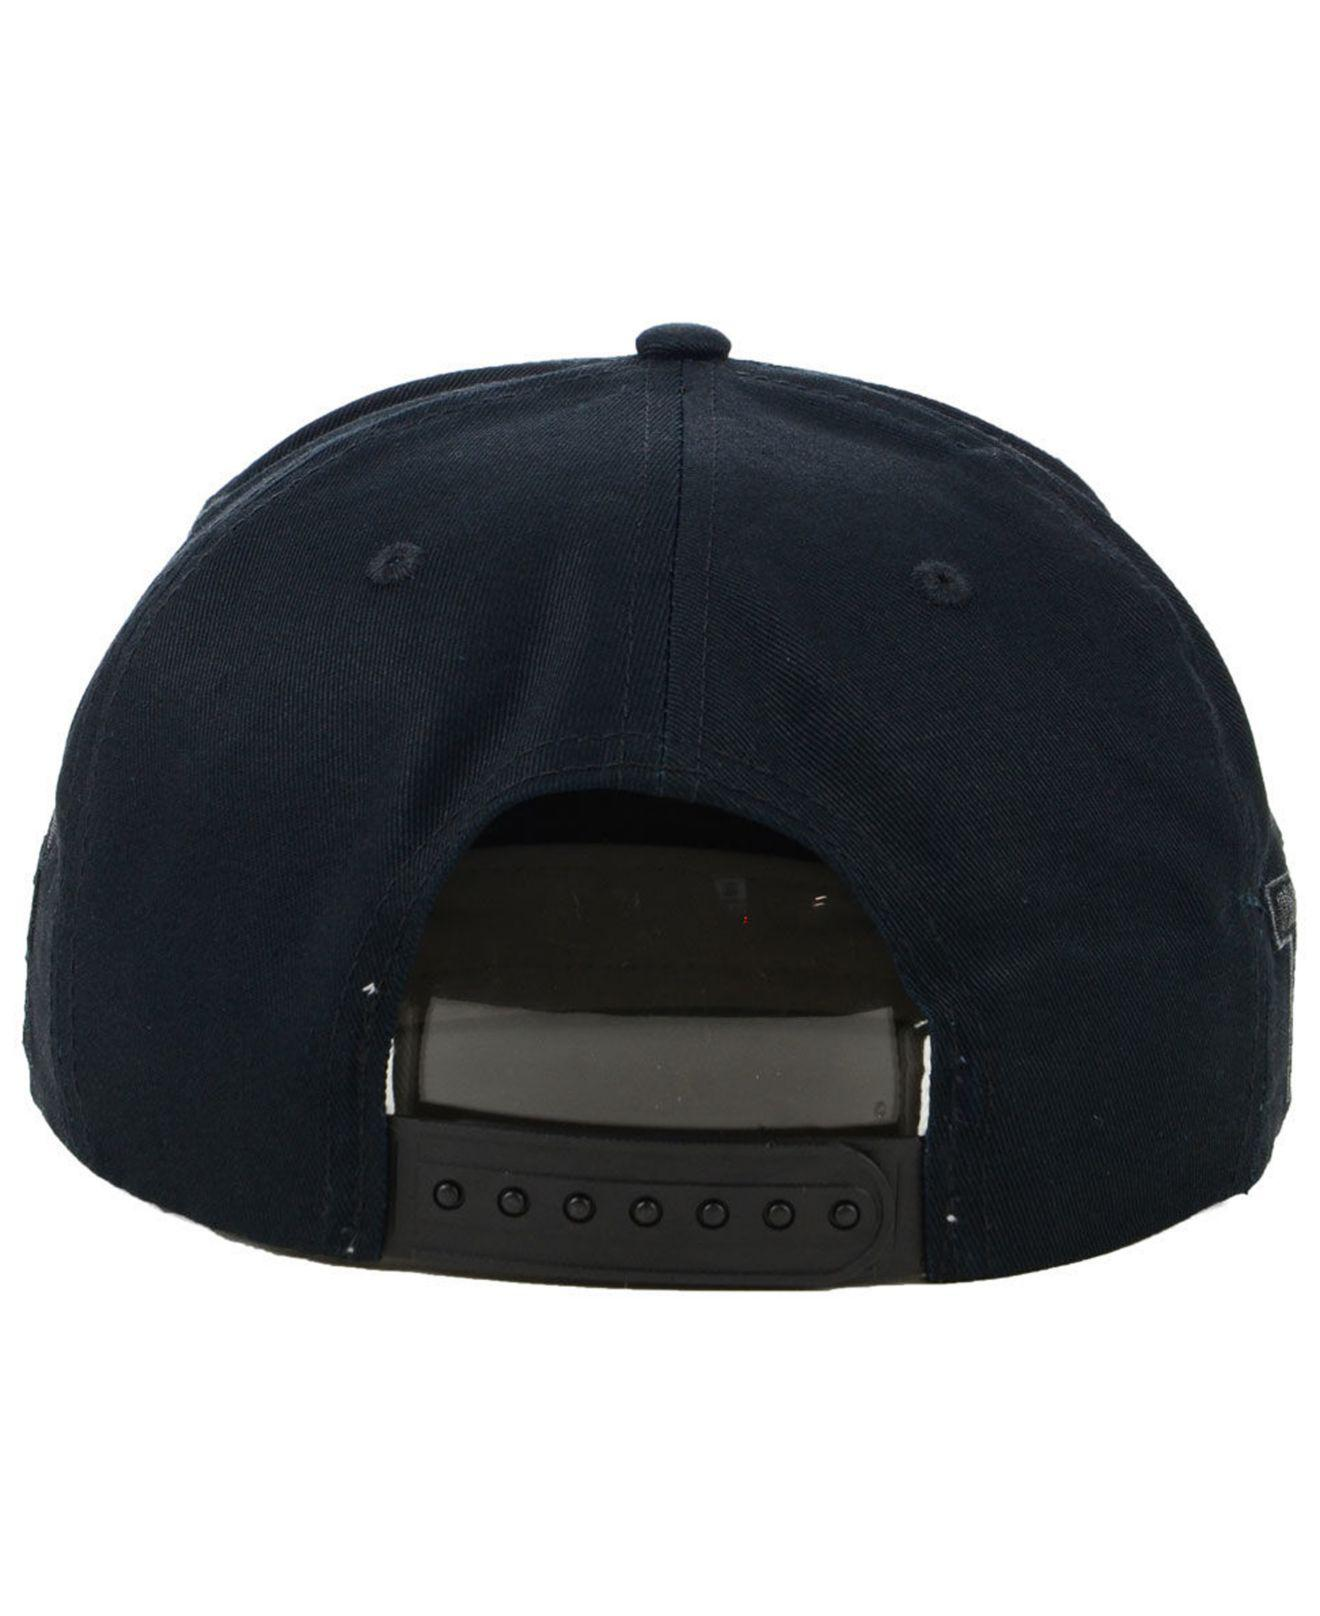 7f1c87bfabb6 ... switzerland nike washington huskies sport specialties black on black  snapback cap for men lyst. view